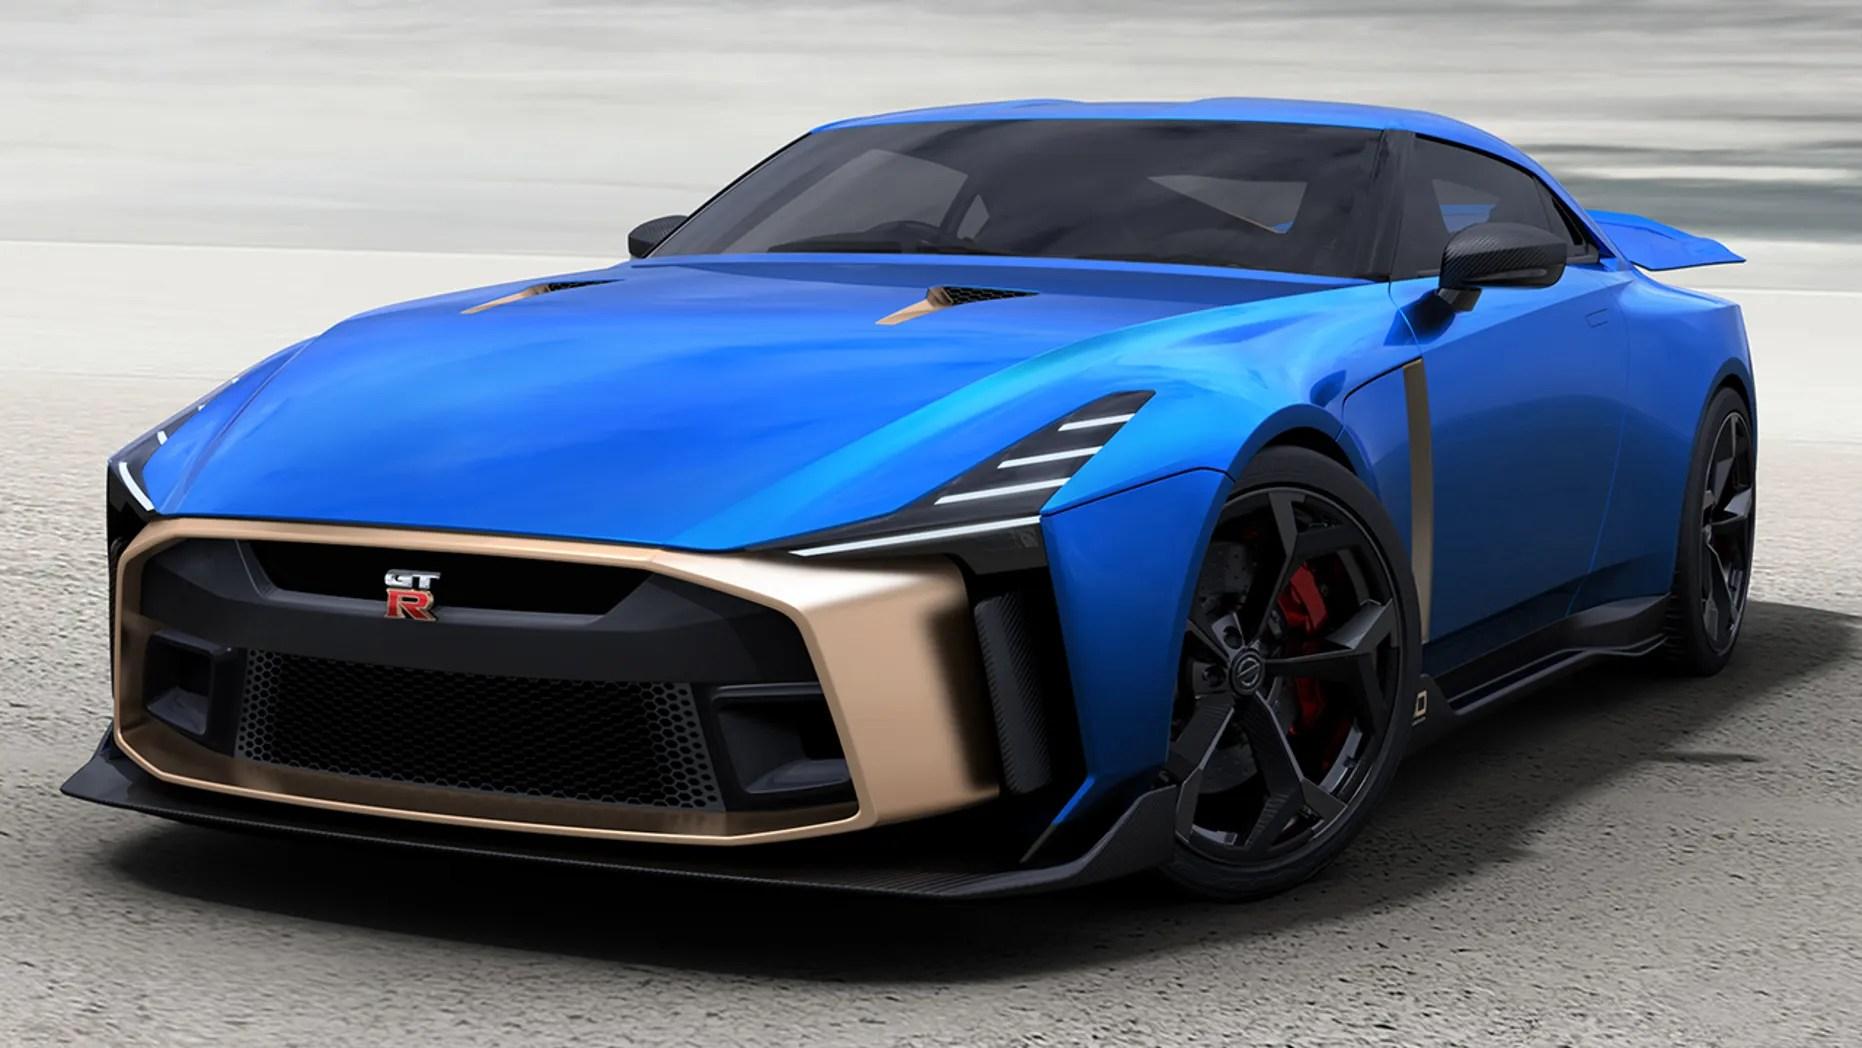 Special Edition Nissan Gt R50 Sports Car Looks Like A Million Bucks Literally Fox News